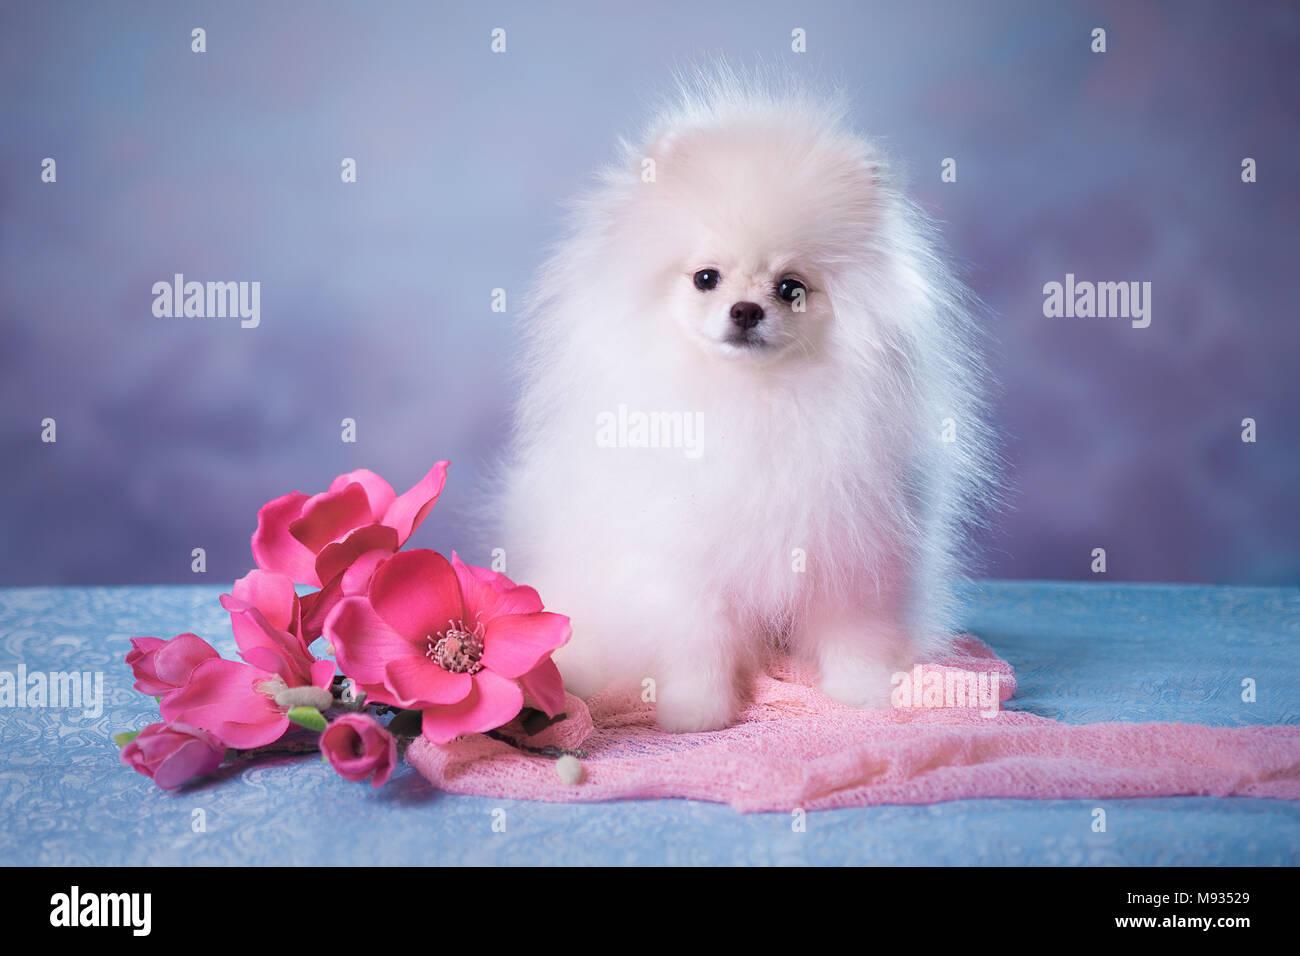 Cute White Fluffy Puppy Stock Photo 177705425 Alamy